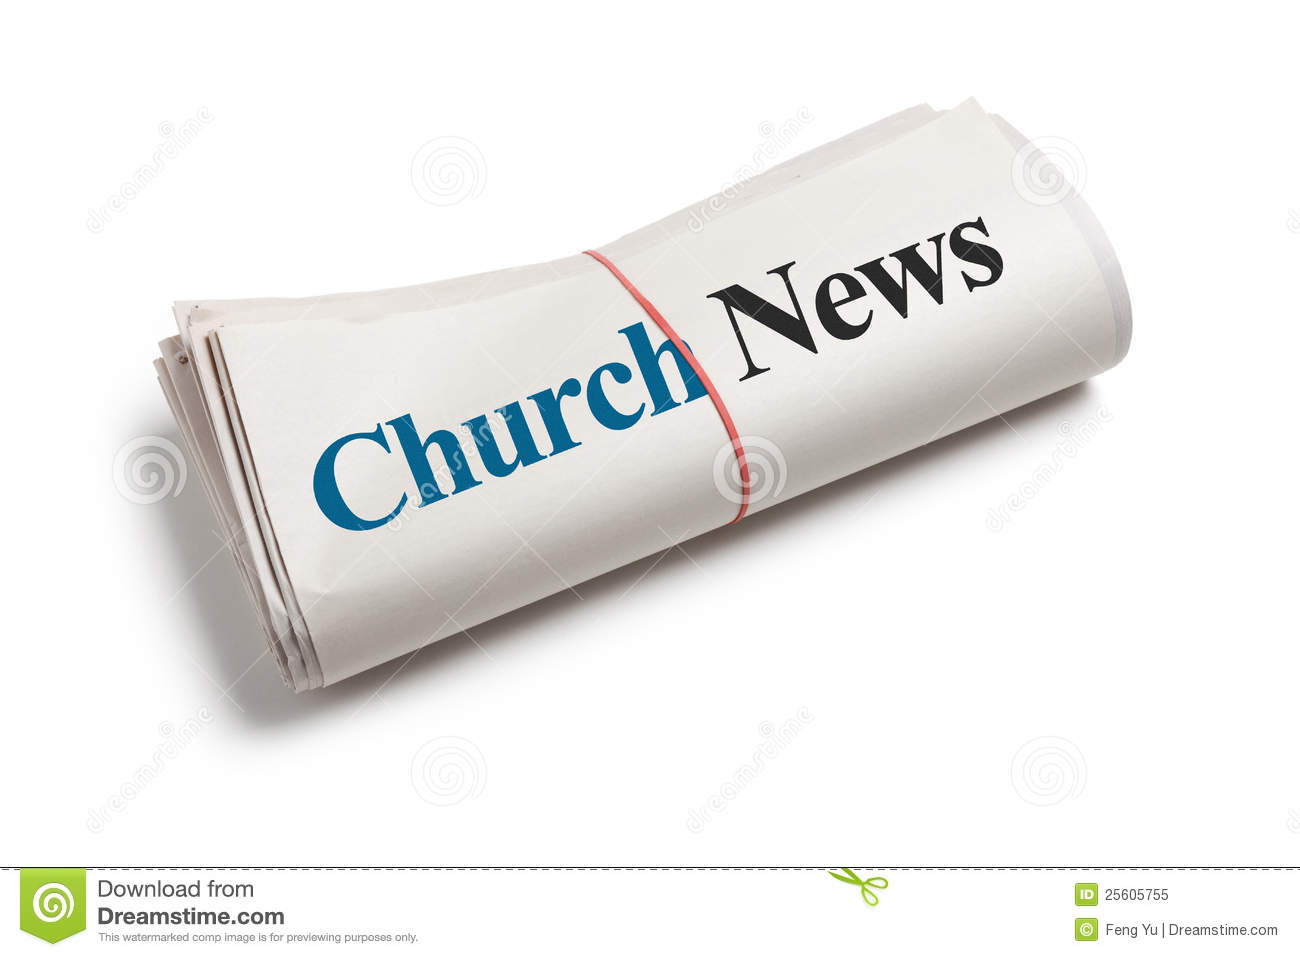 Church News stock image. Image of white, background, church.